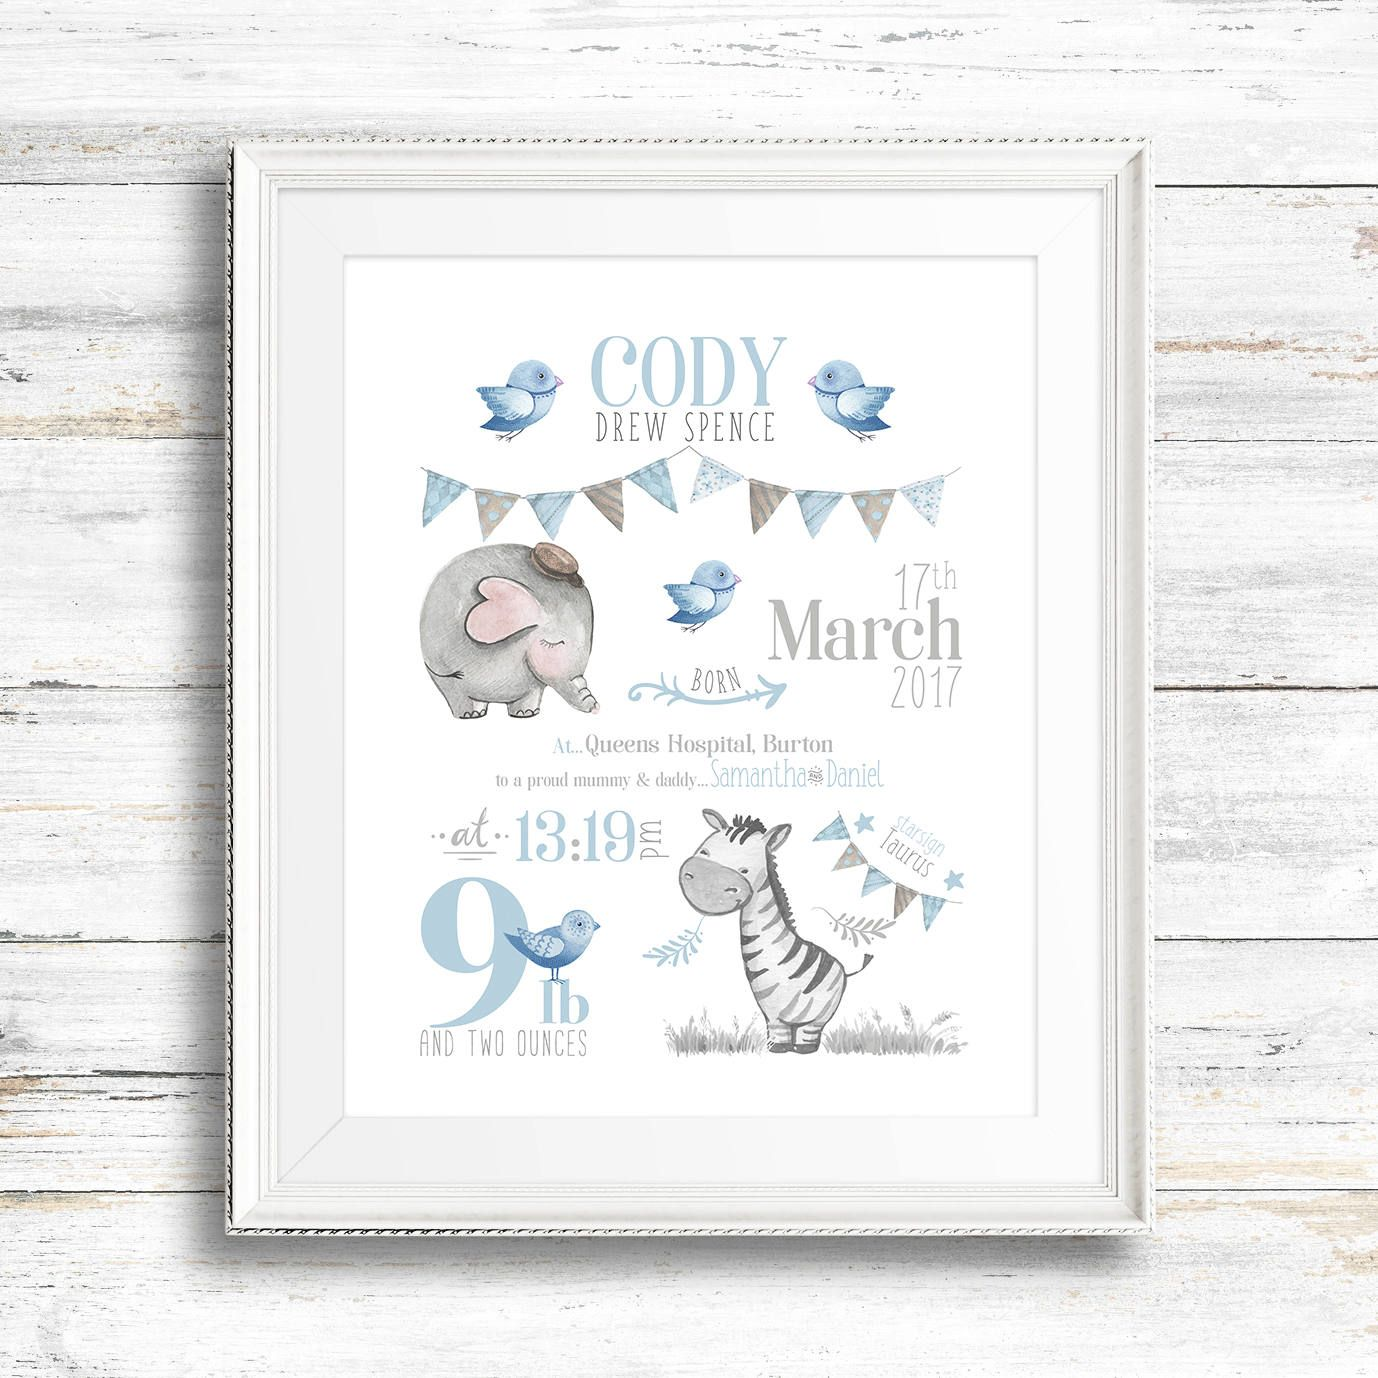 DIGITAL FILE Personalised Print New Baby Girl Boy Wall Art Christening Newborn Baby Gift